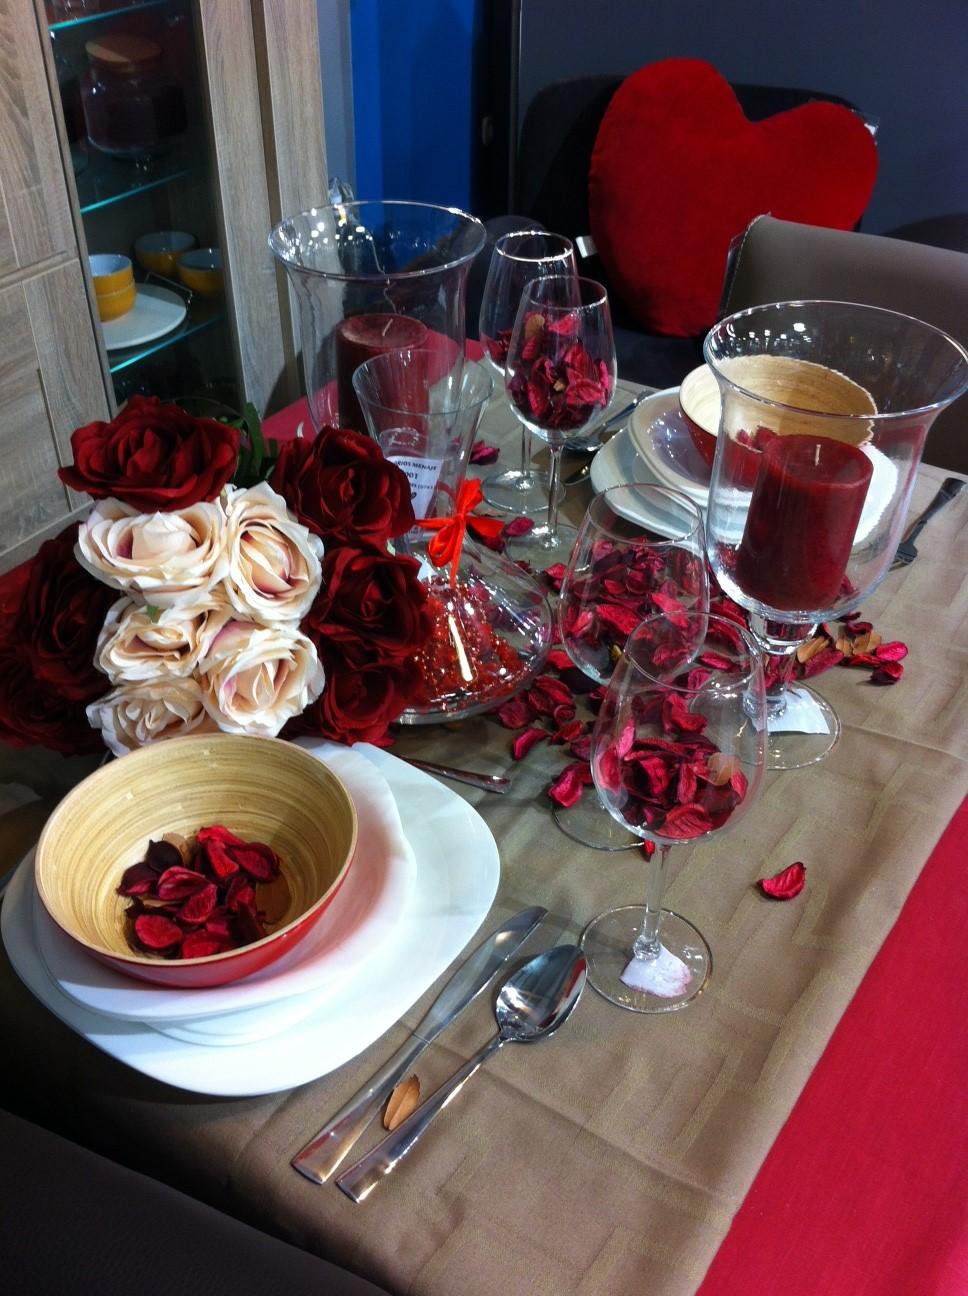 San valent n blog de zenia boulevard - Detalles para cena romantica ...